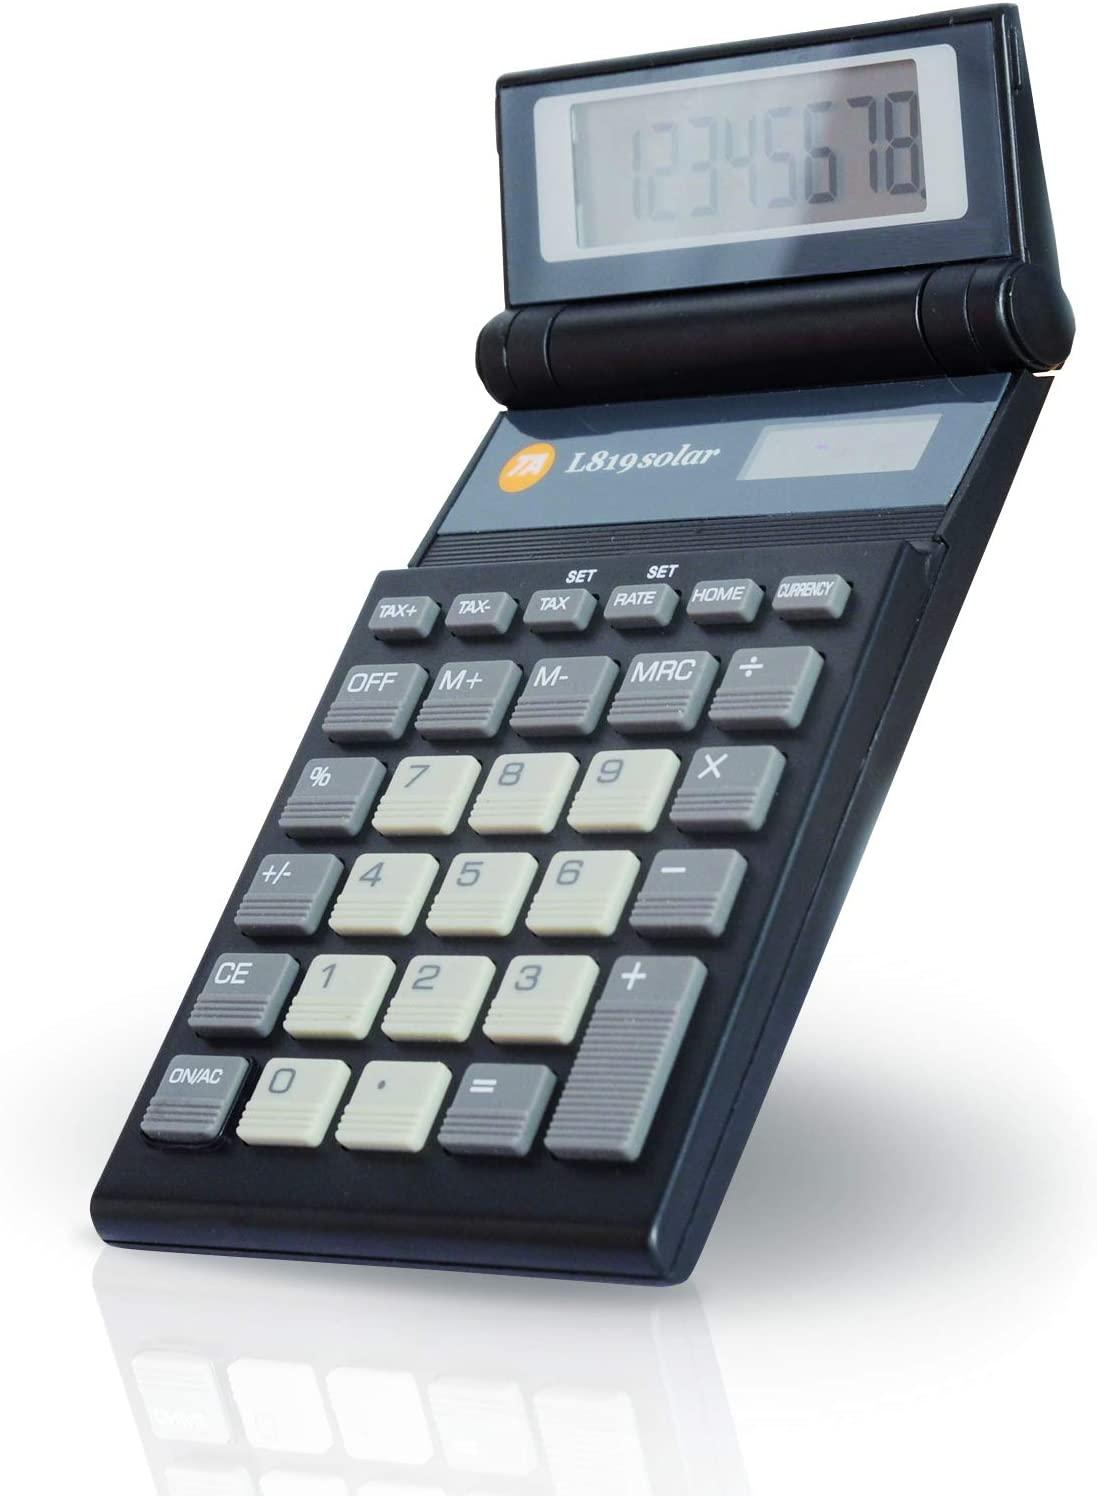 kaminorth shop Rakuten Global Market High compact calculator of